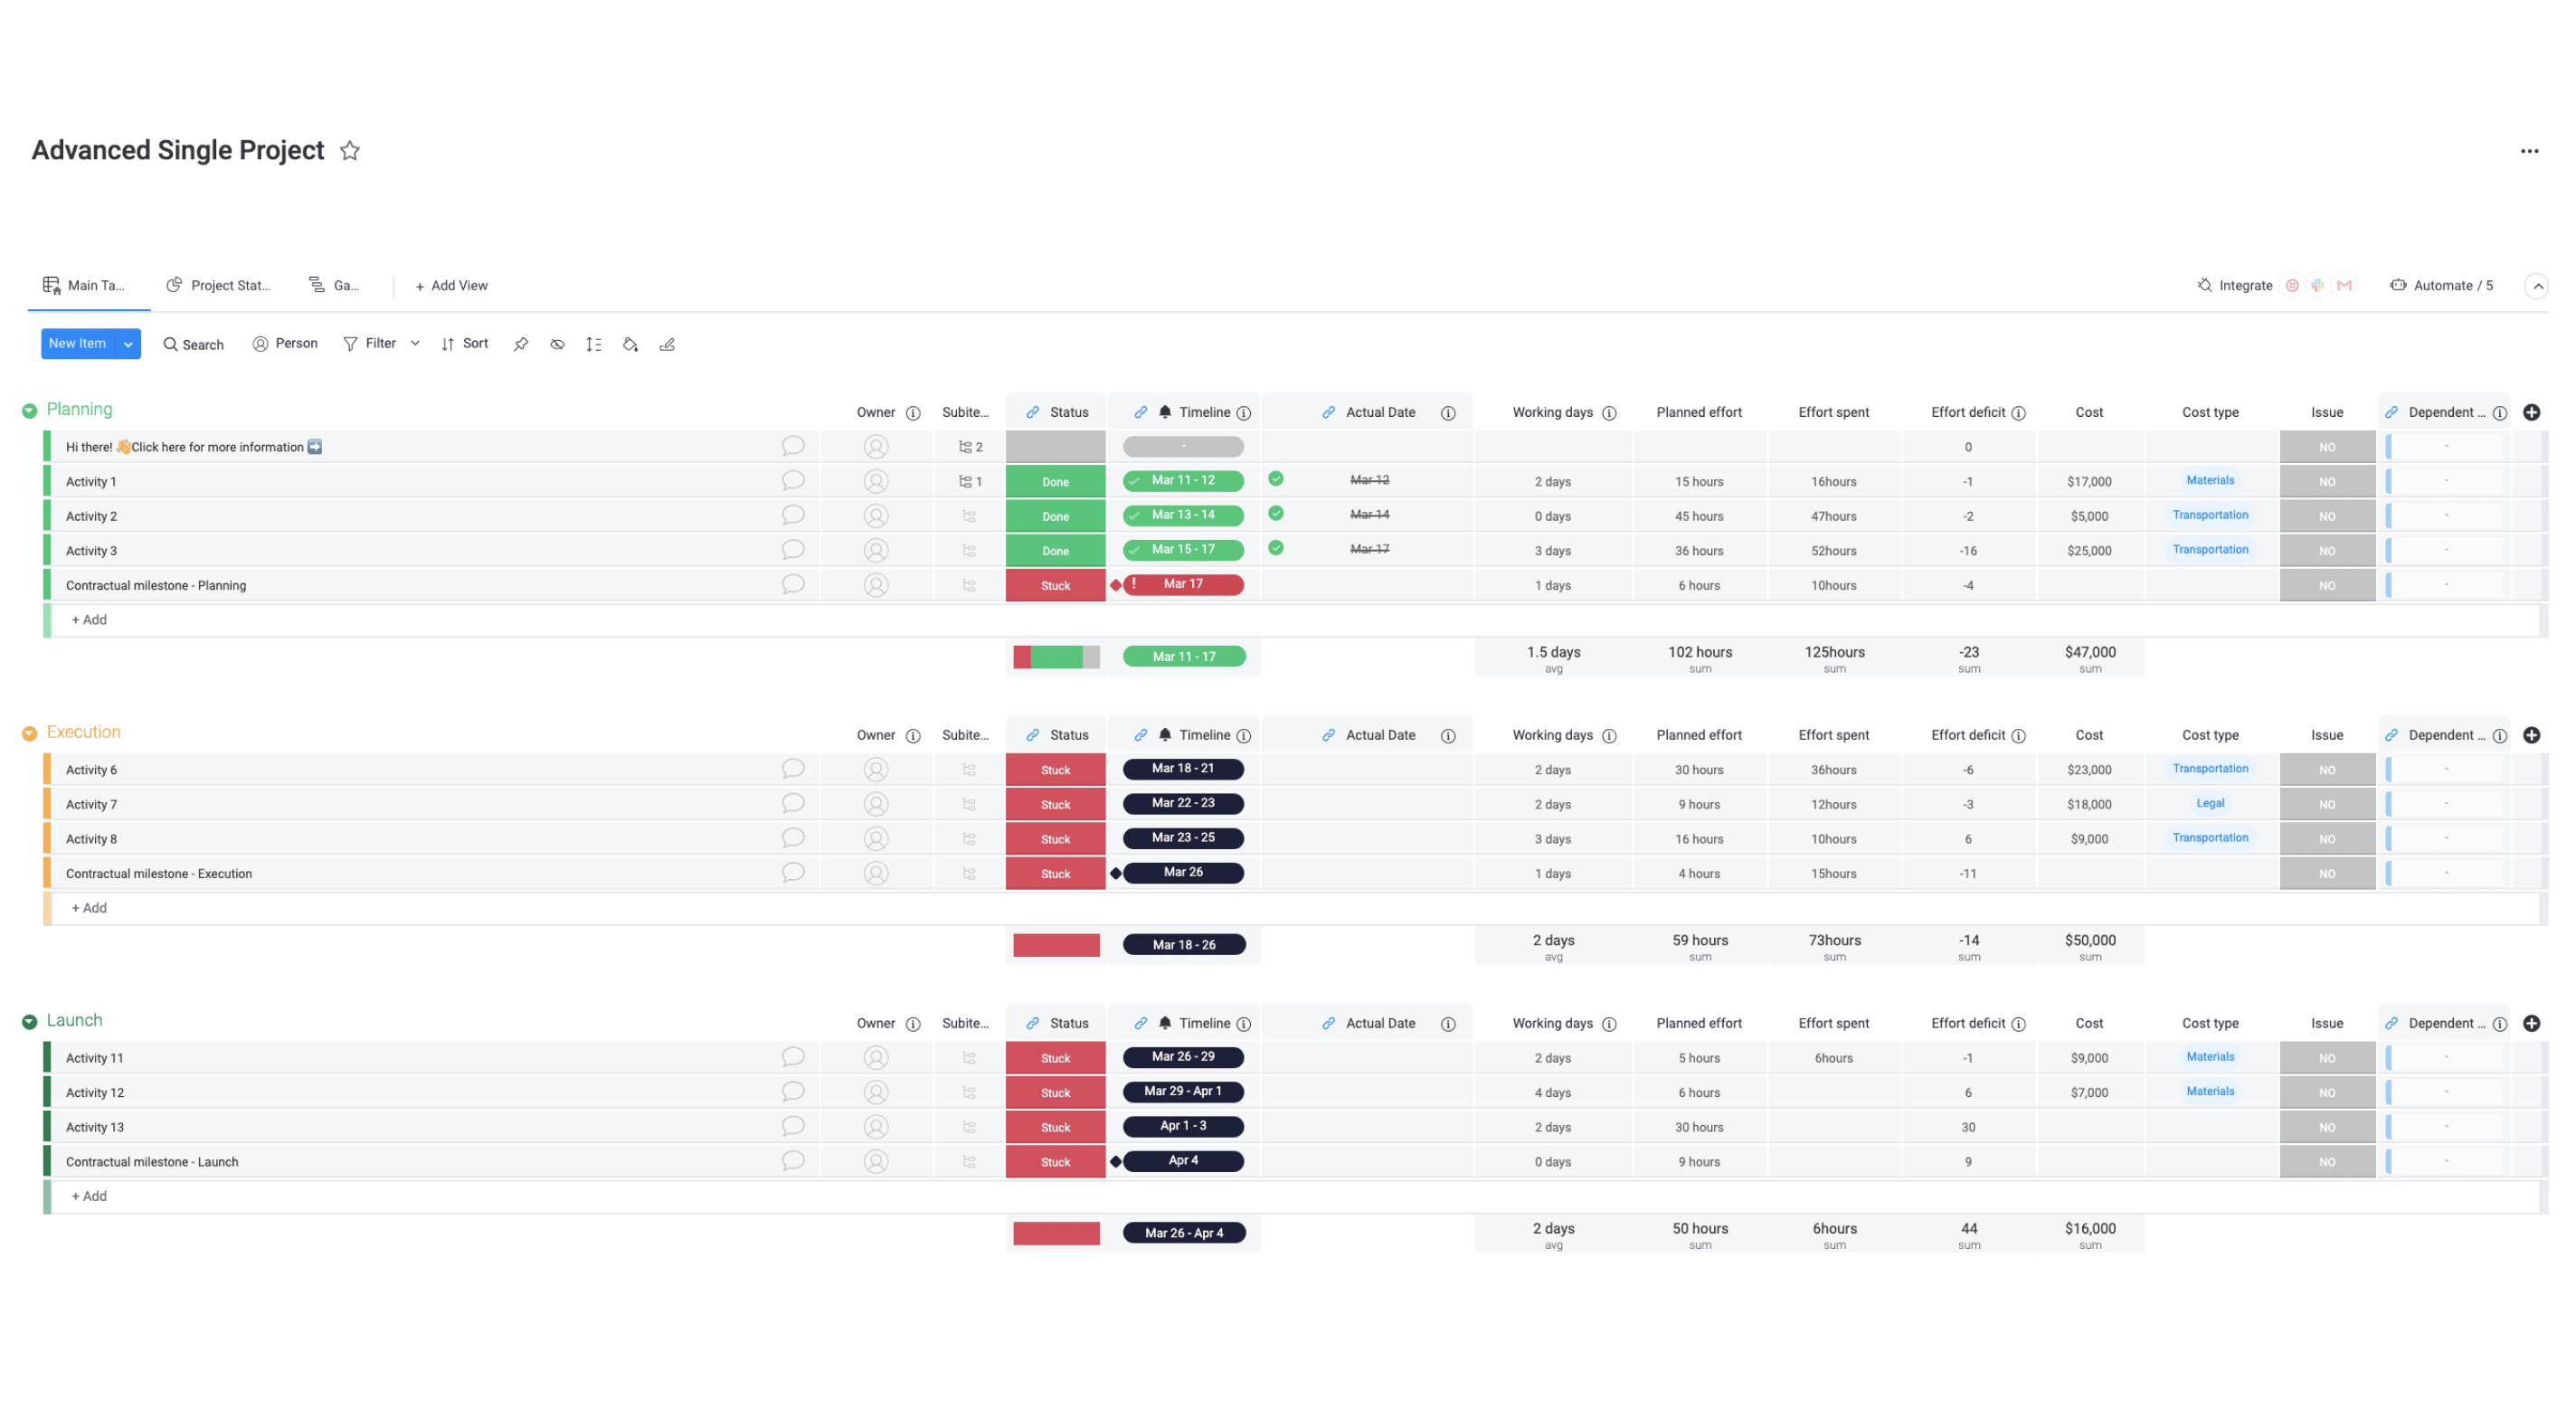 advanced single project board